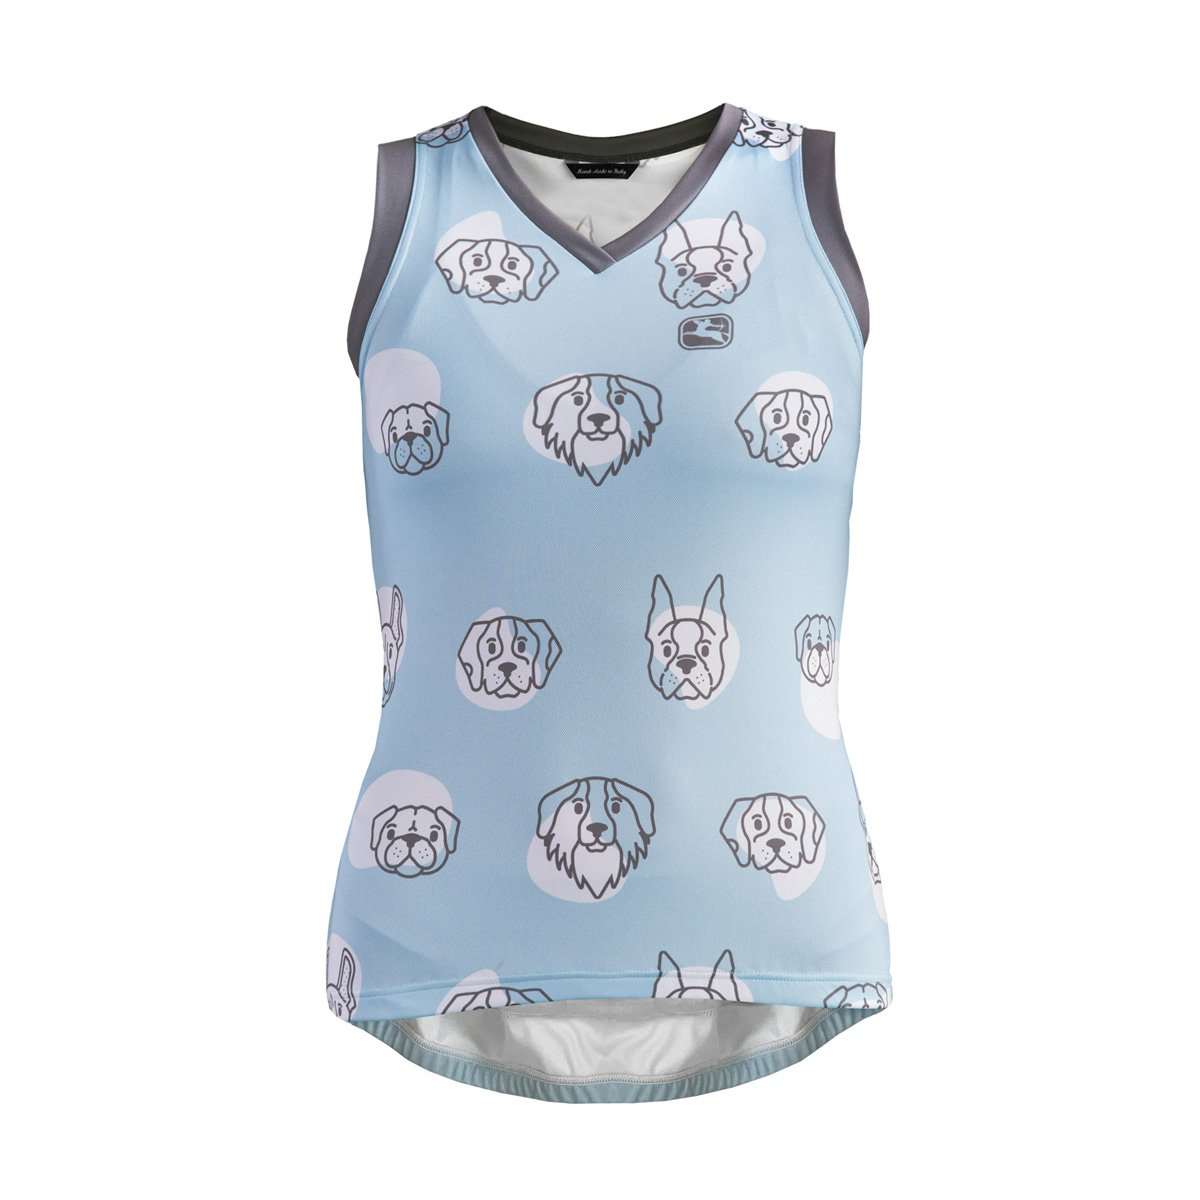 Giordana Arts Sleeveless Jersey – Women 's B0797DTMRQ Large|PUPS-LIGHT BLUE/GREY PUPS-LIGHT BLUE/GREY Large